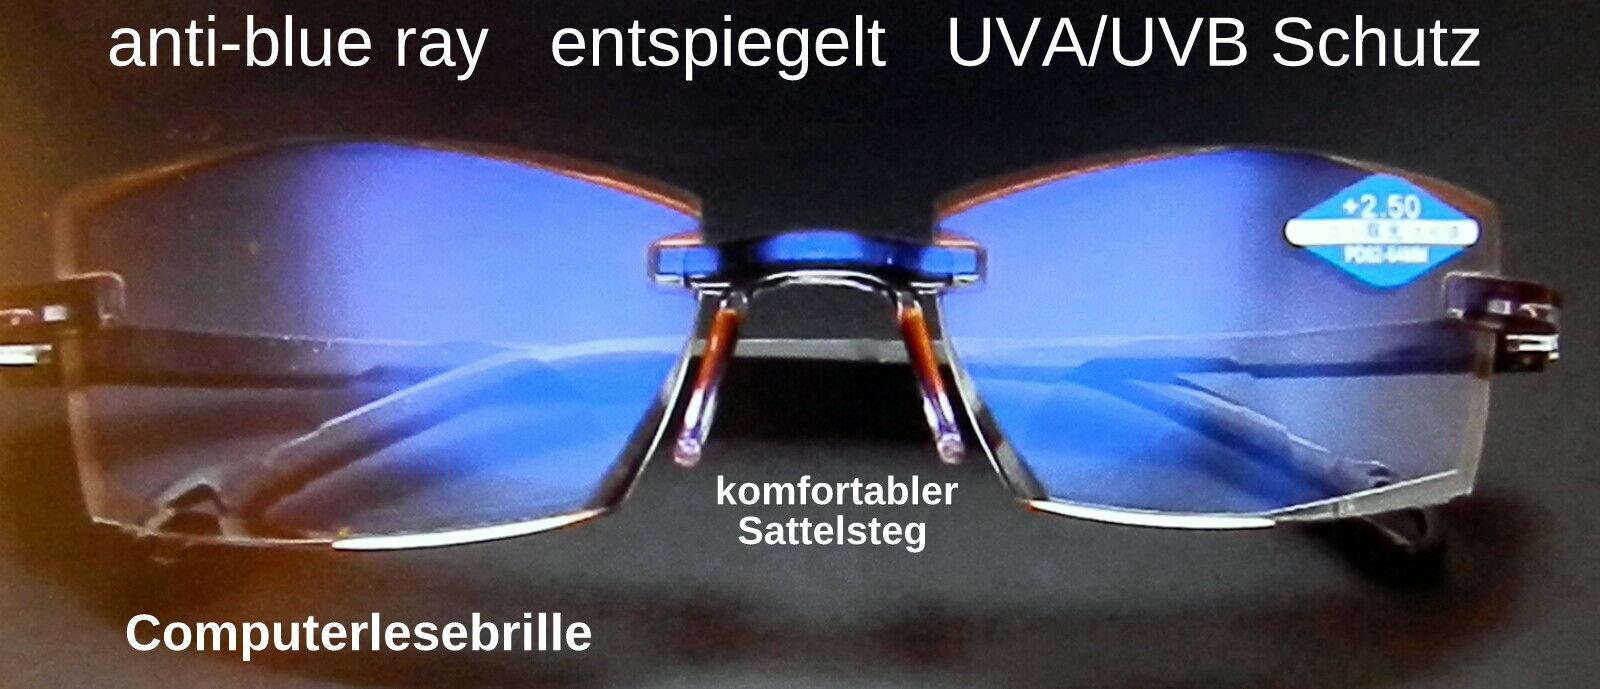 Computer Lesebrille Bifocal randlos Sattelsteg unisex Anti-Blu-Ray 14 gr.